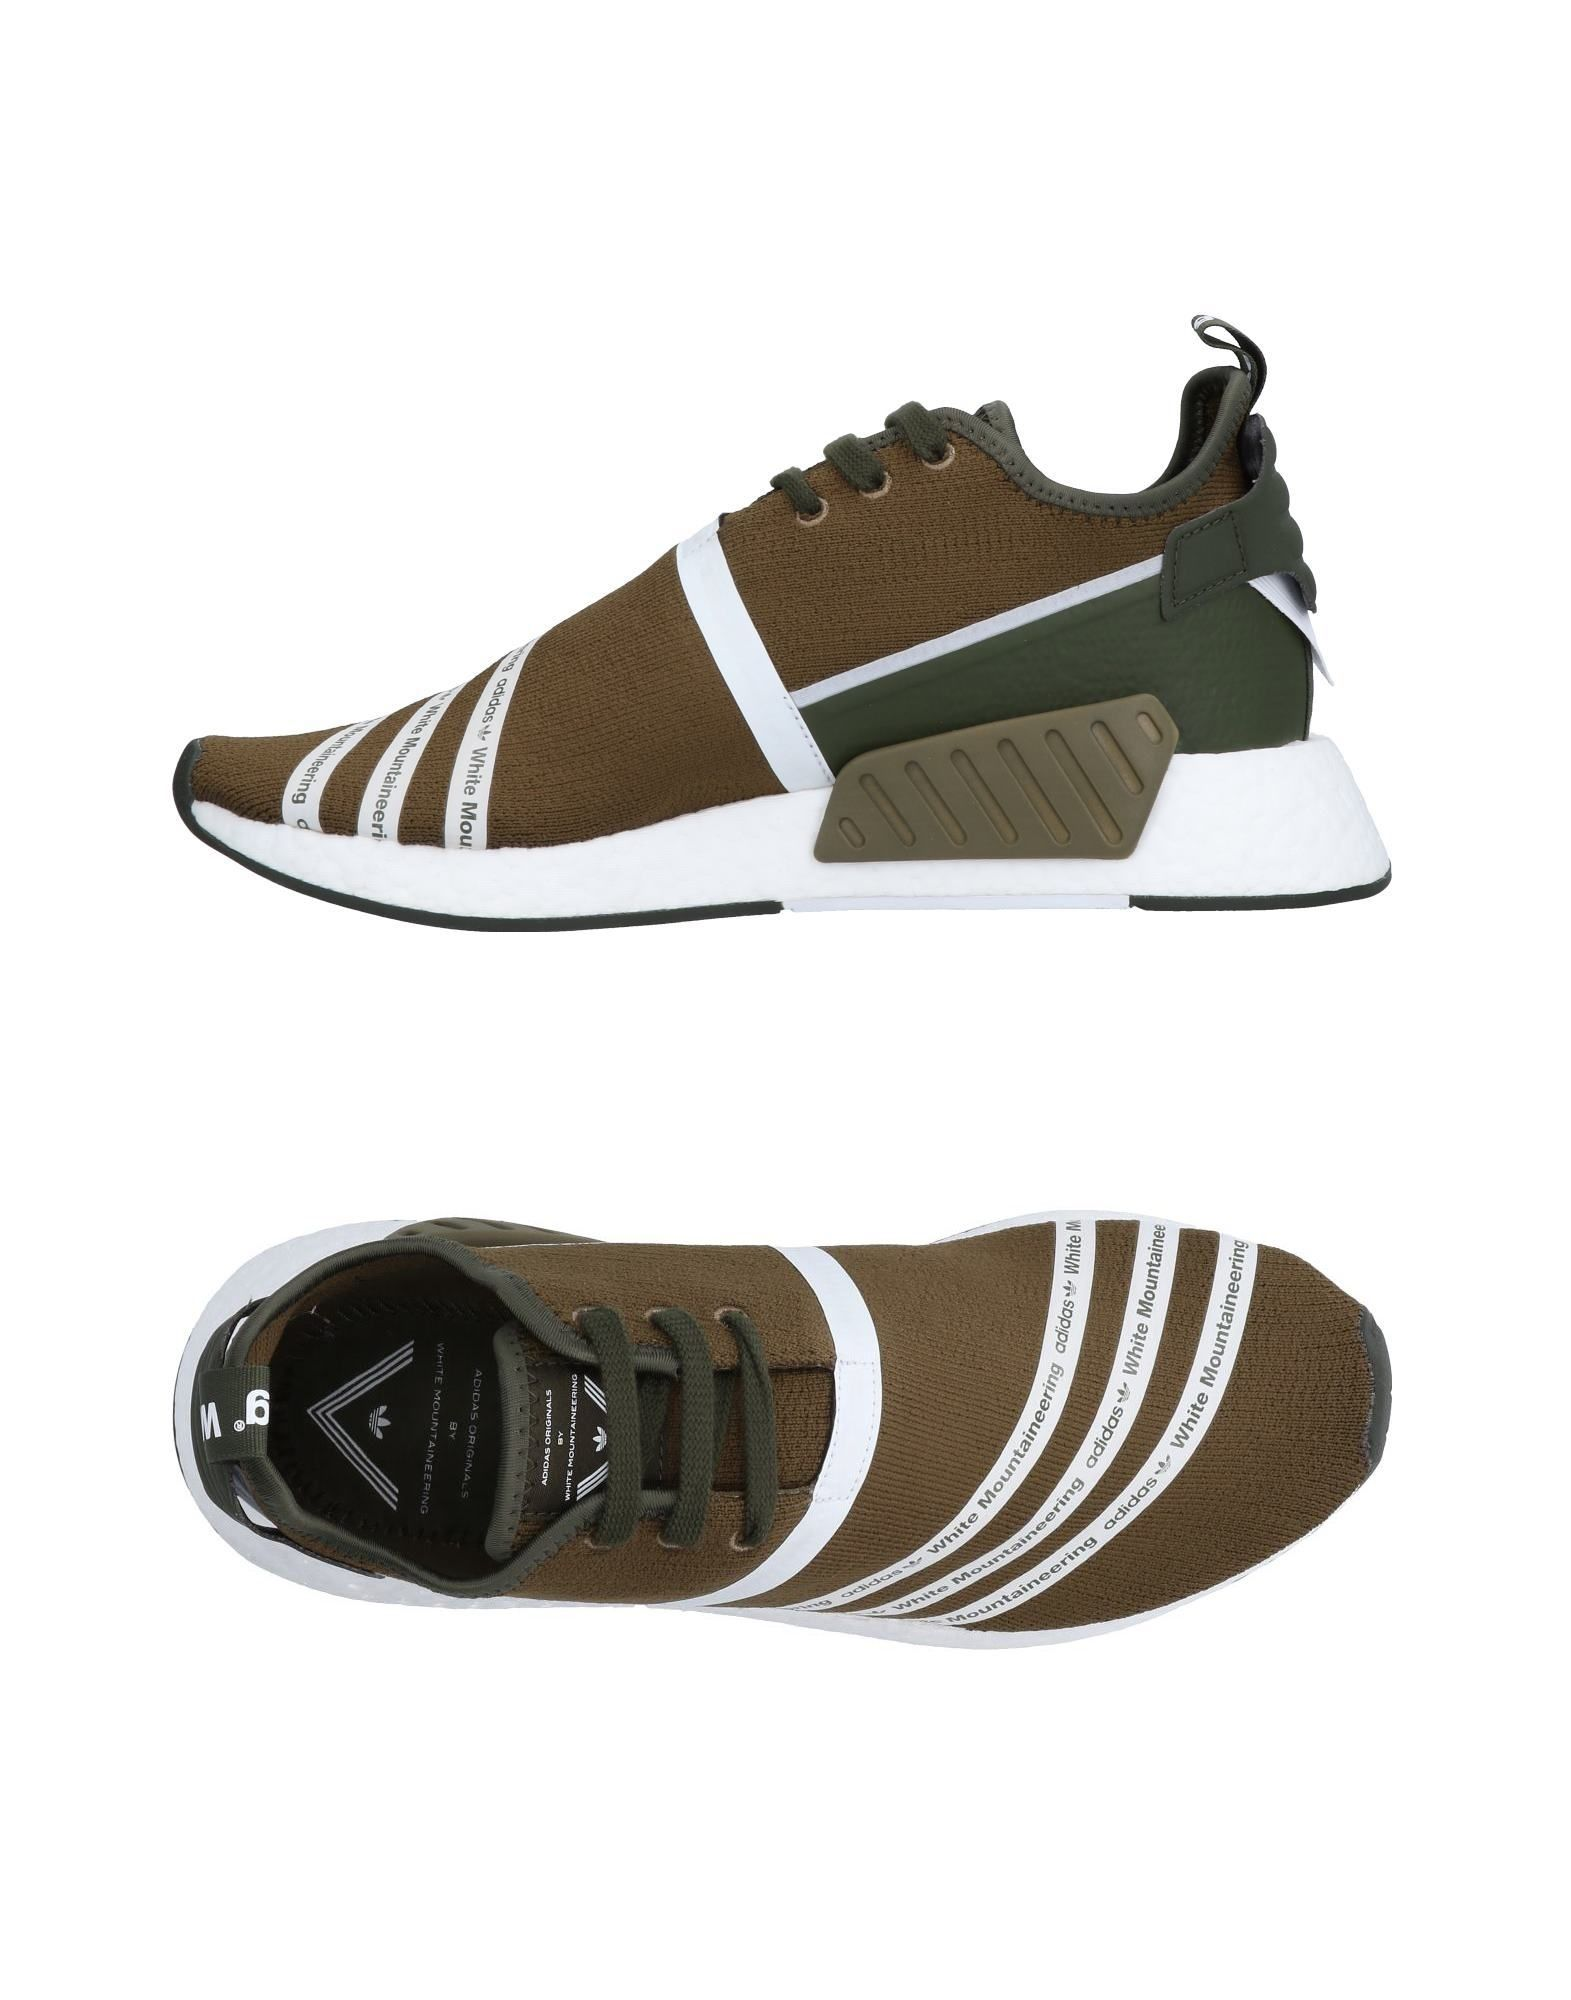 ADIDAS ORIGINALS by WHITE MOUNTAINEERING Низкие кеды и кроссовки adidas originals by jeremy scott низкие кеды и кроссовки